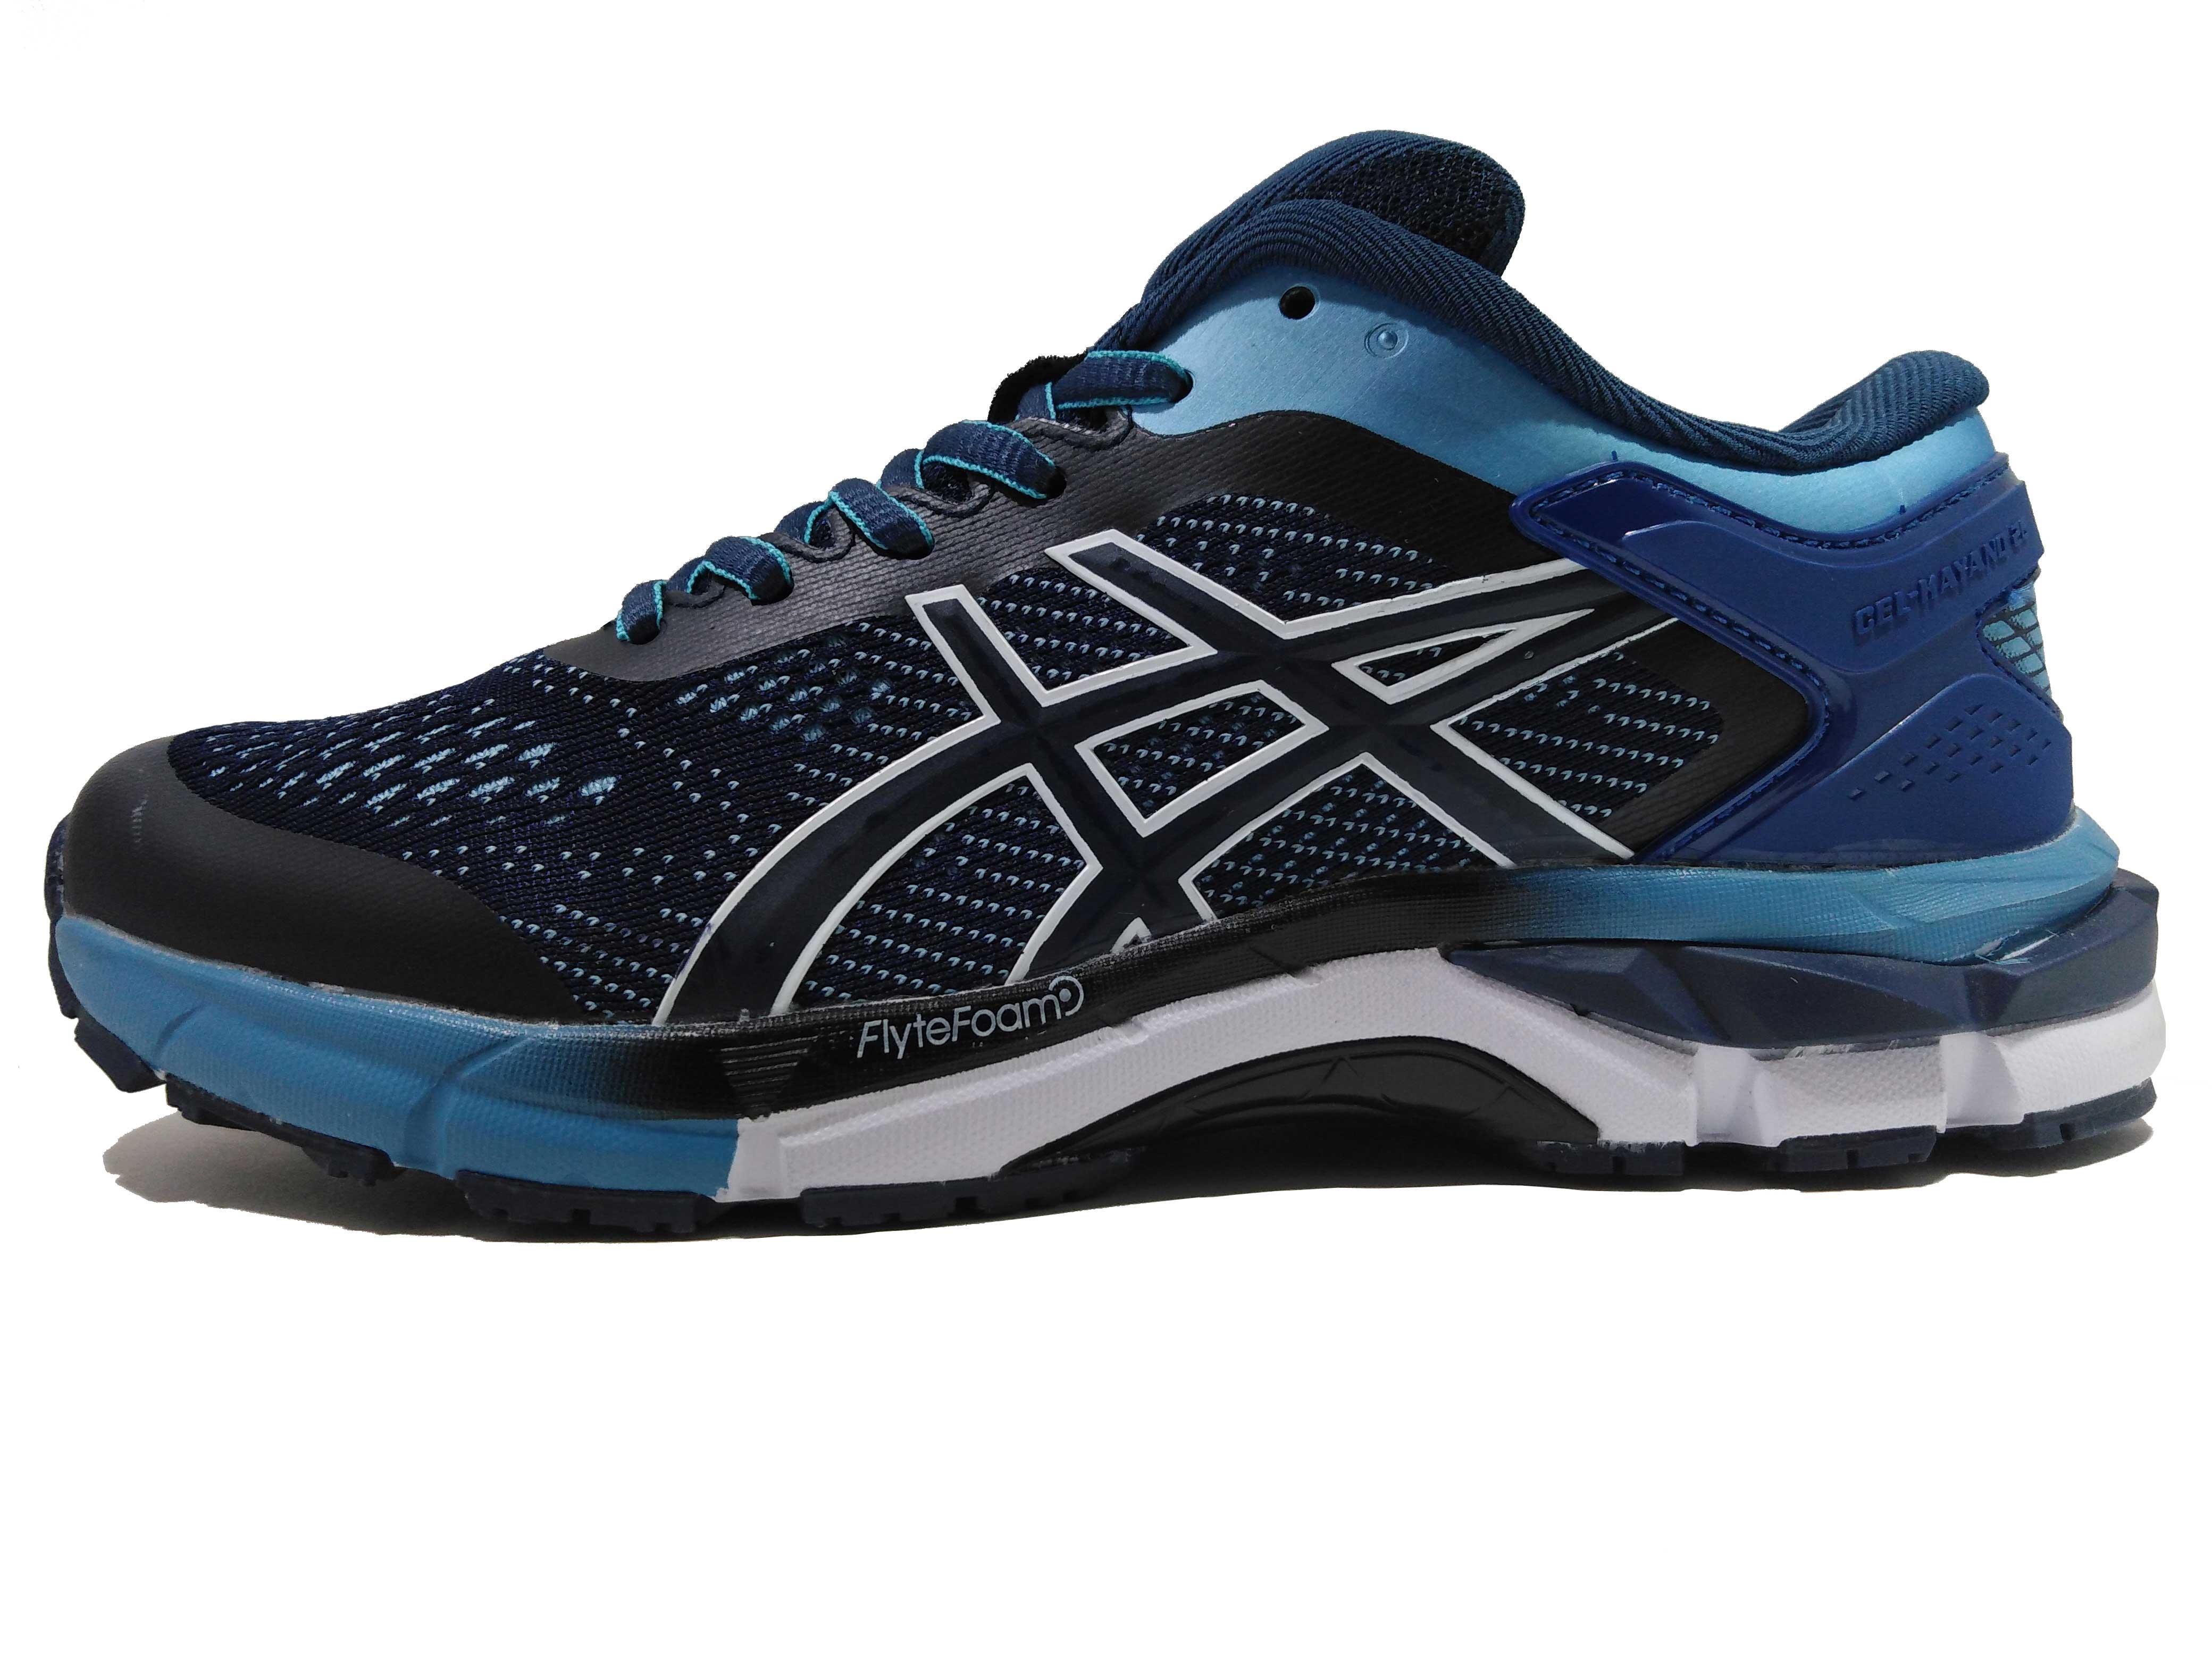 کفش مخصوص دویدن مردانه اسیکس مدل GEL - KAYANO 26